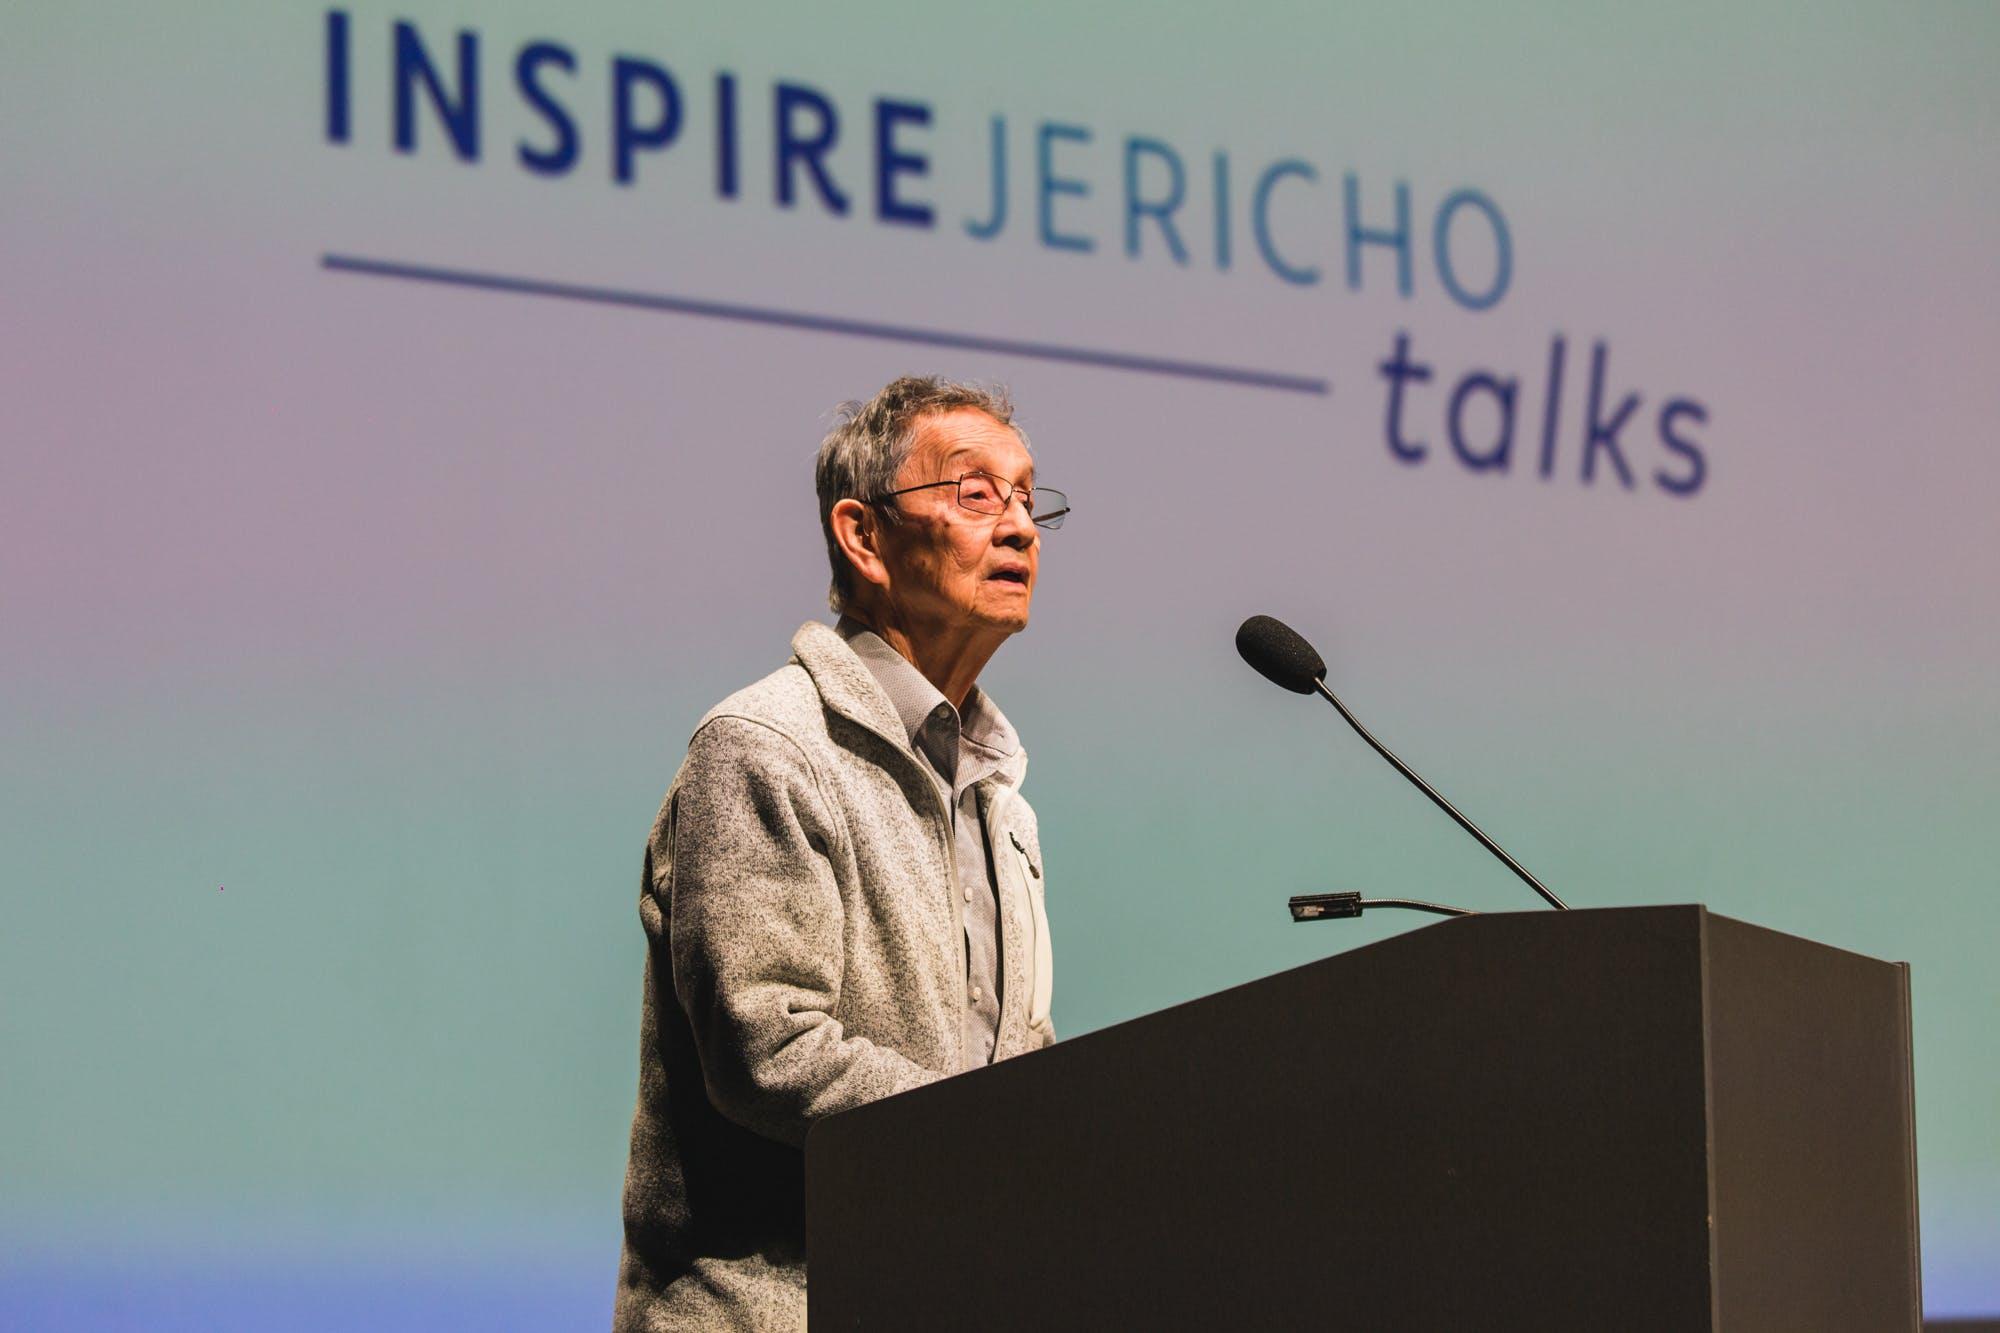 Inspire Jericho Talks - Creating Great Neighbourhoods 2